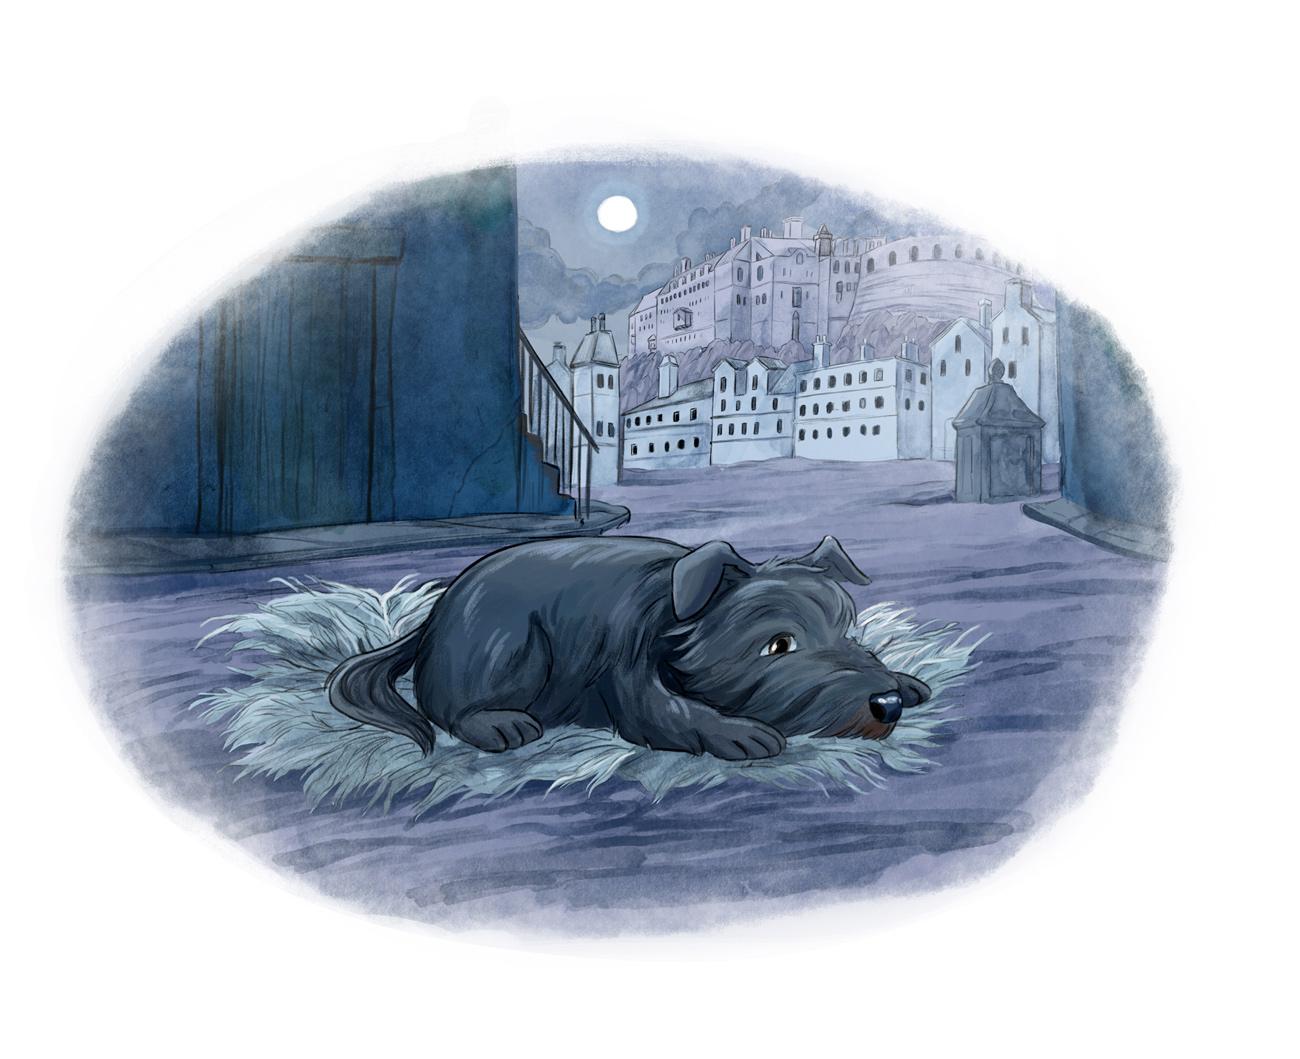 Bobby the dog sad in the night